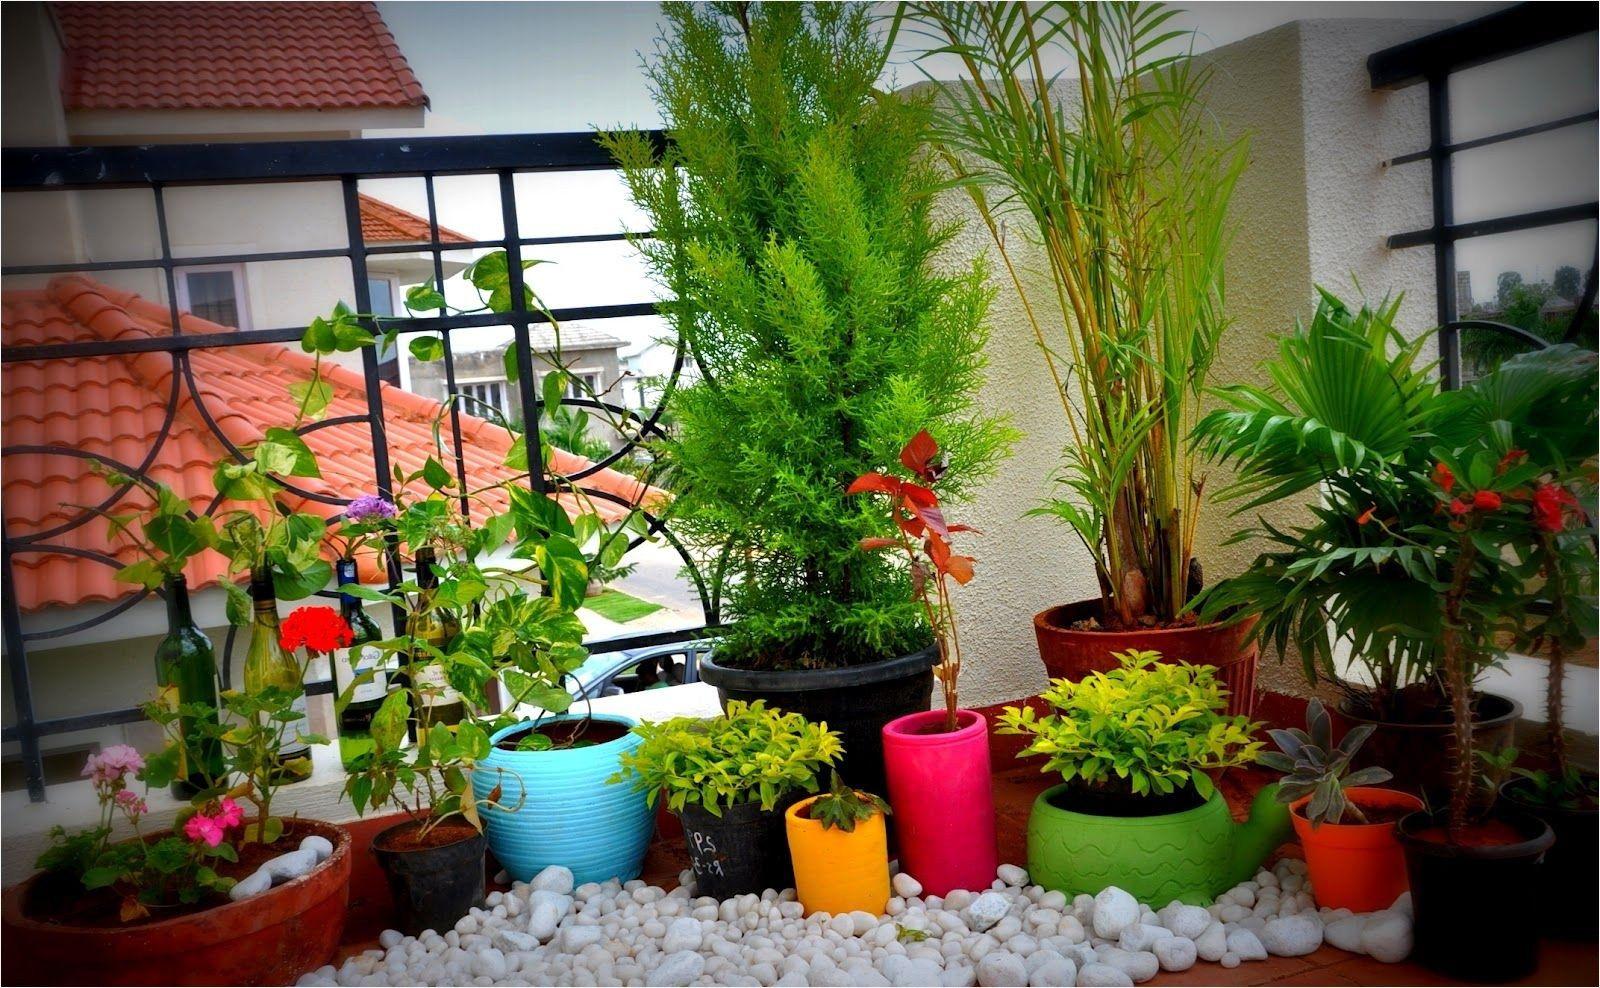 45 Cozy And Beautiful Small Terrace Design Ideas Daily Home List Patio Garden Design Small Space Gardening Small Balcony Garden